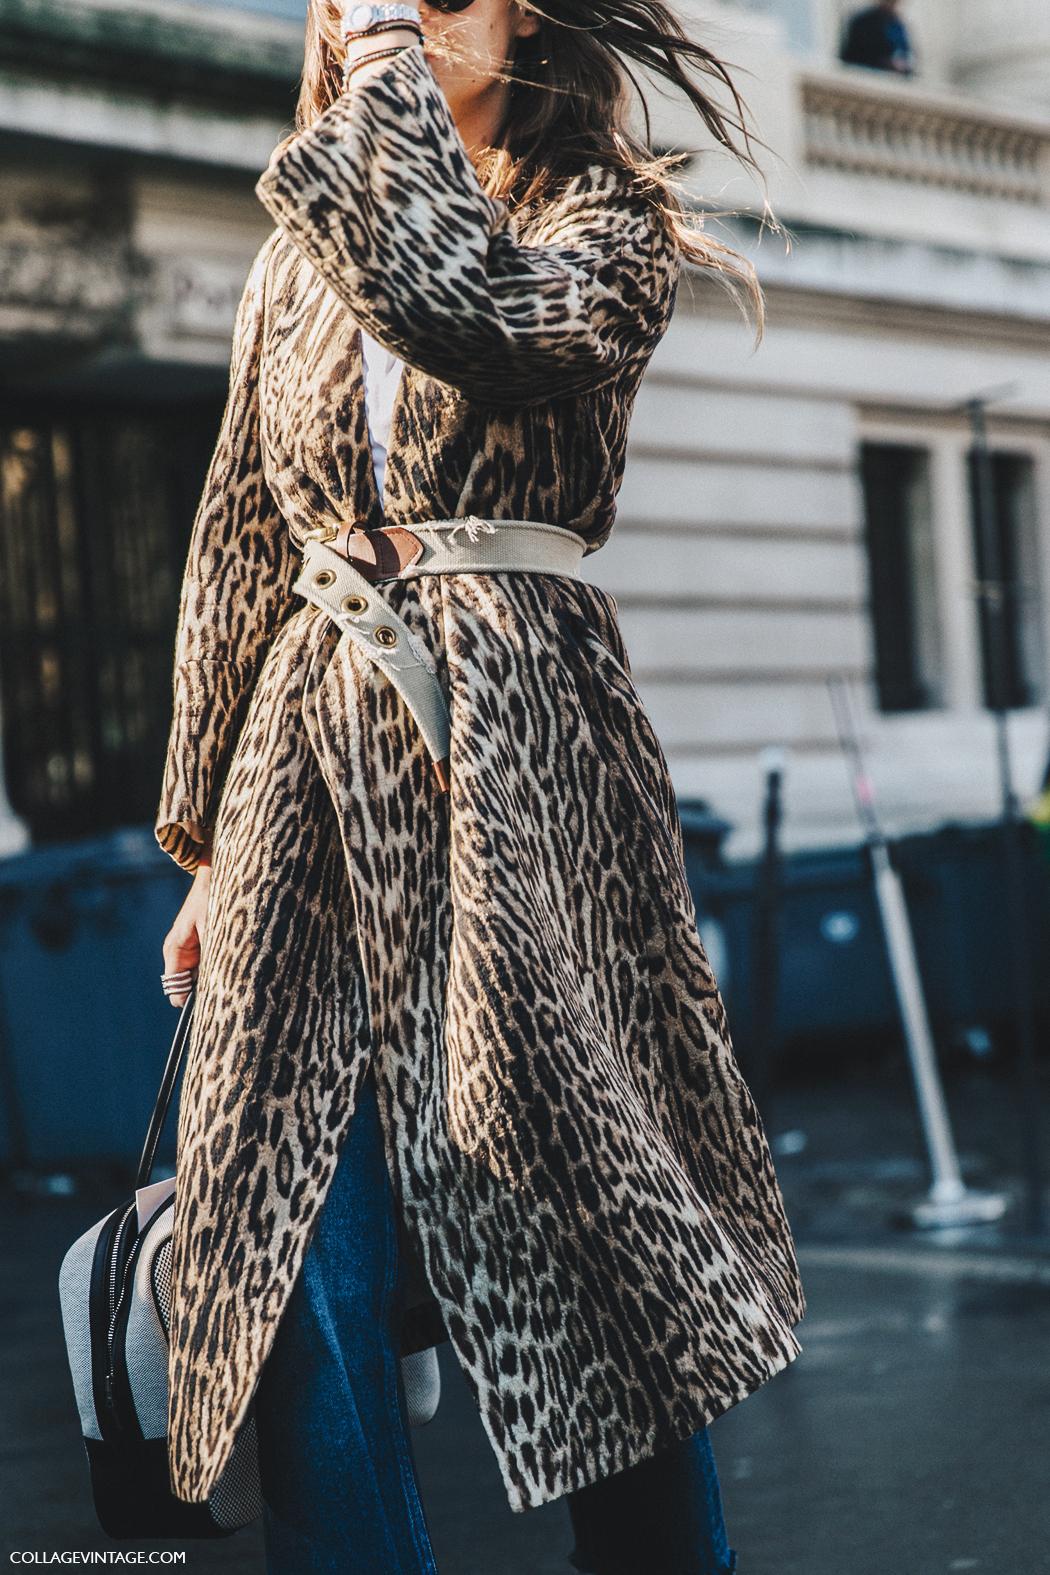 PFW-Paris_Fashion_Week_Fall_2016-Street_Style-Collage_Vintage-Miroslava_Duma-Chloe_Coat-Ripped_Jeans-Gucci_Sandals-8